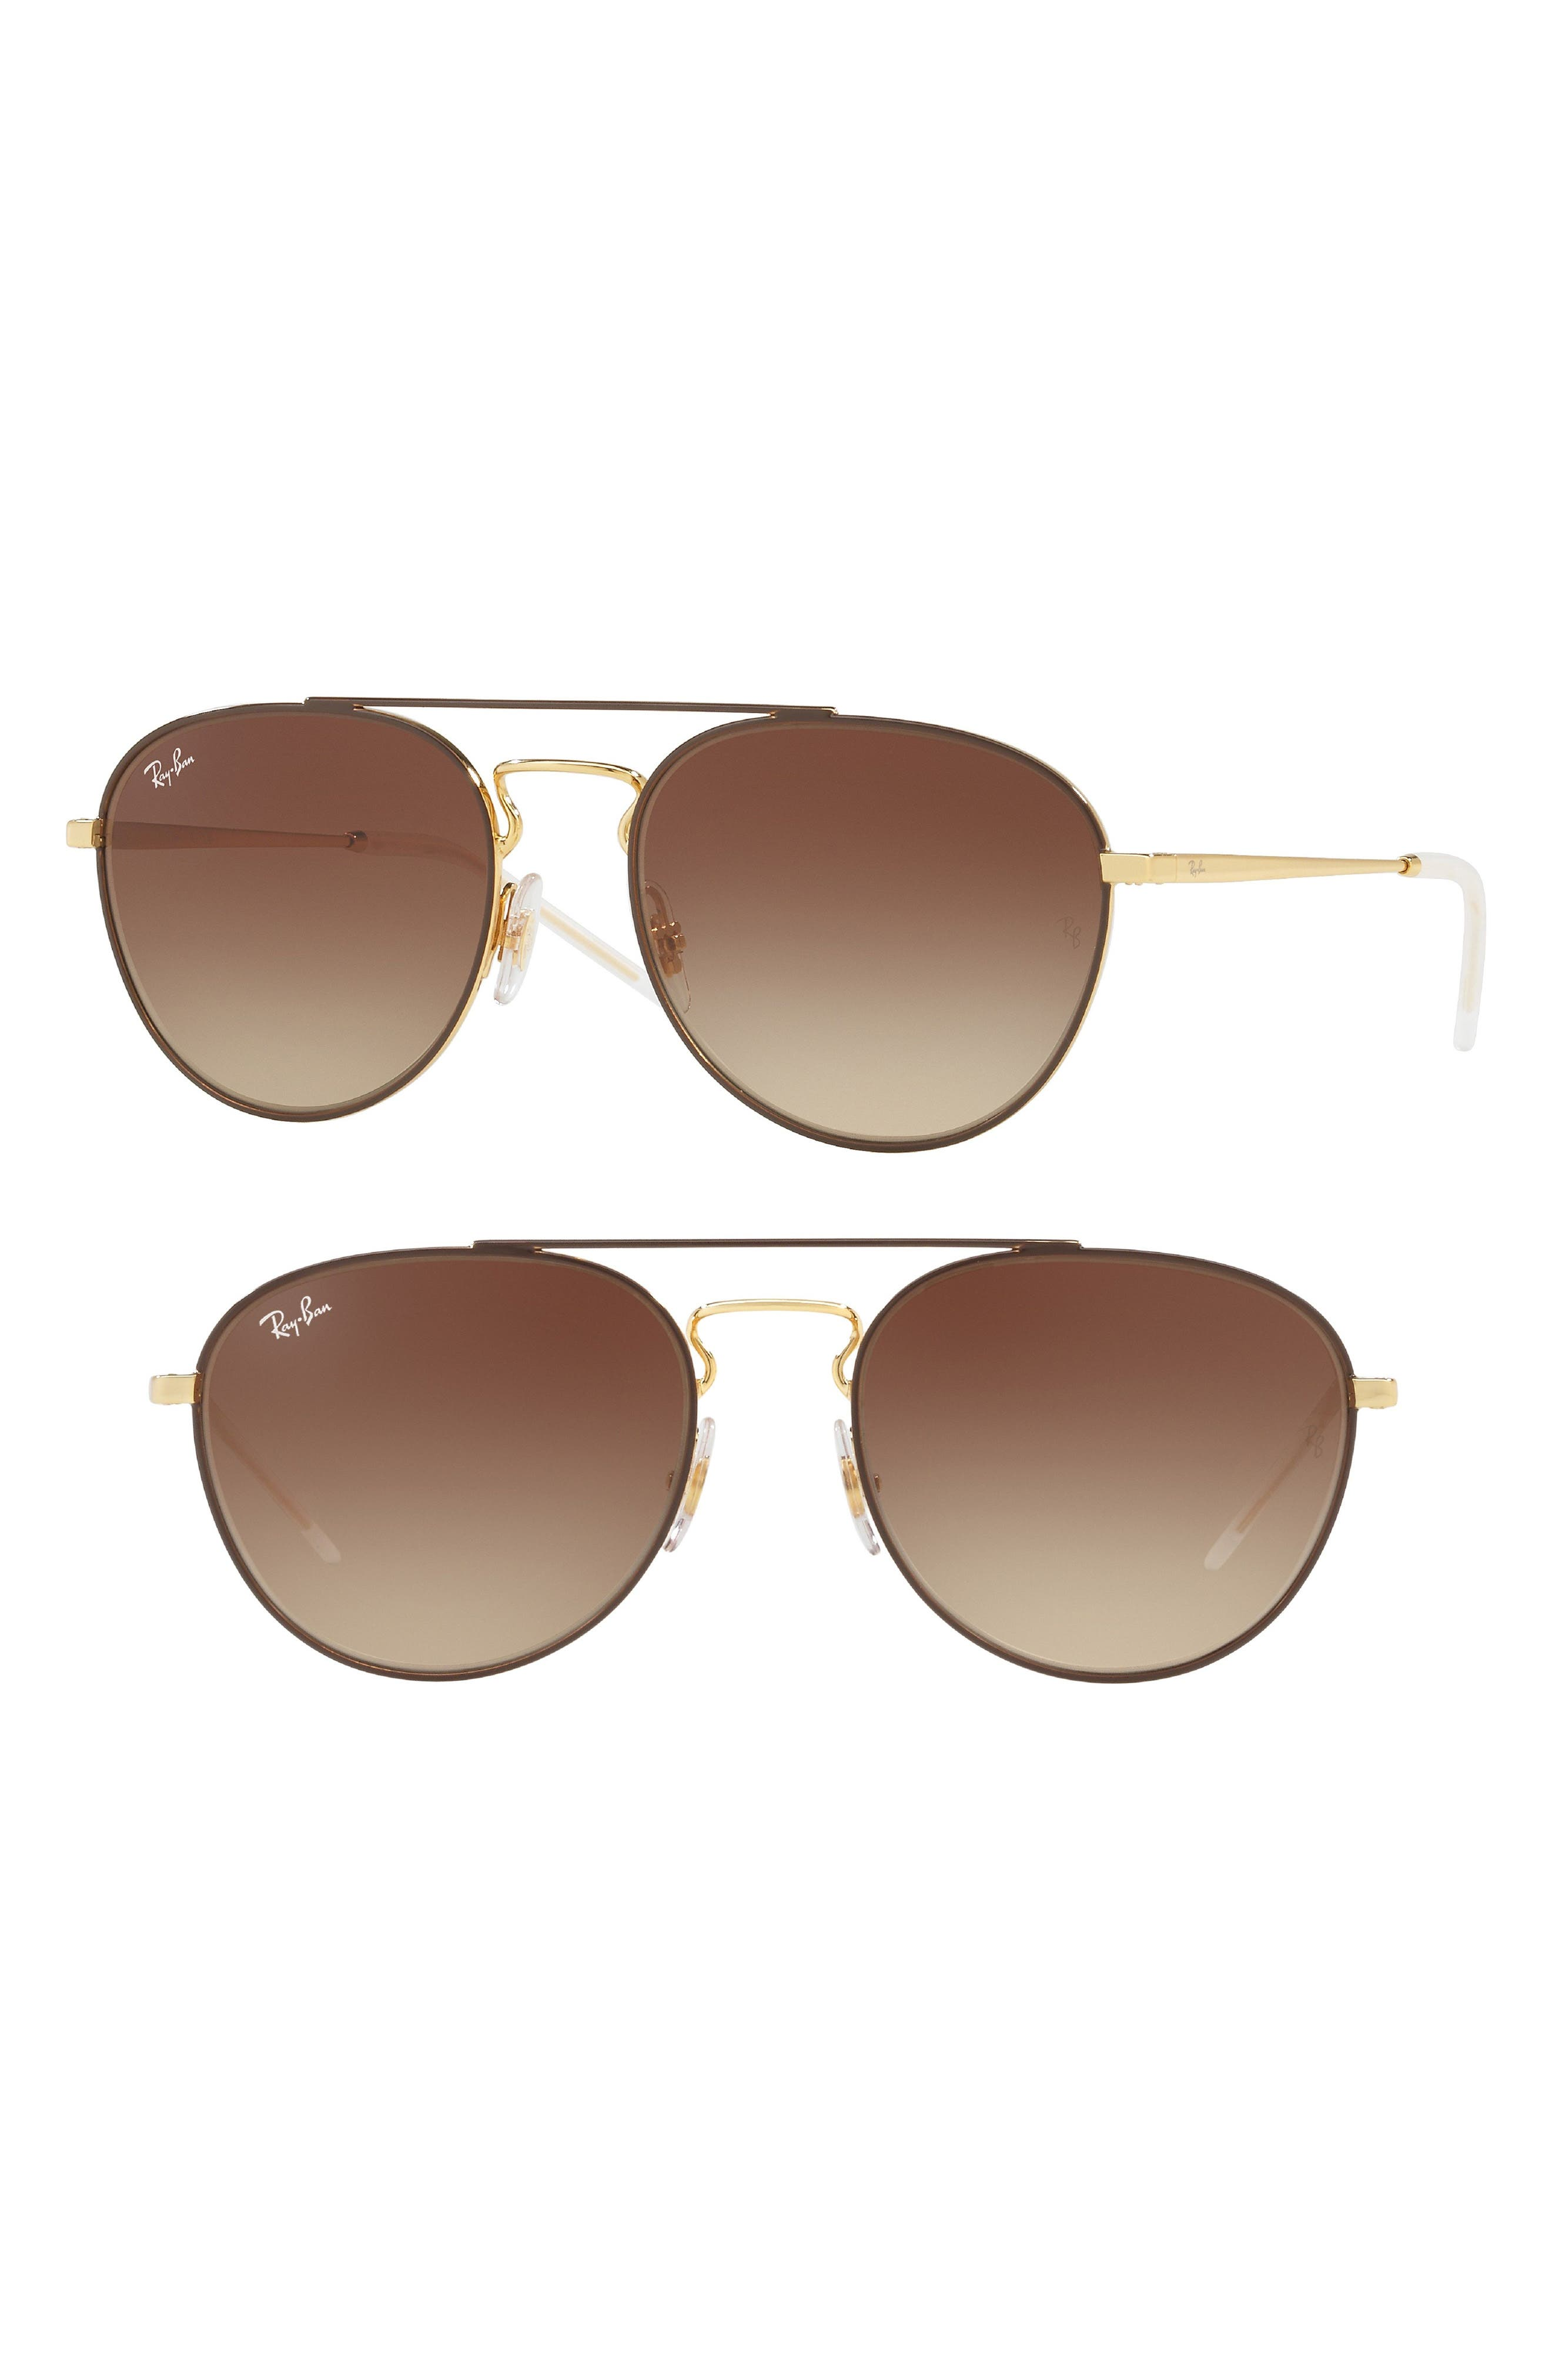 55mm Gradient Lens Round Aviator Sunglasses,                             Main thumbnail 2, color,